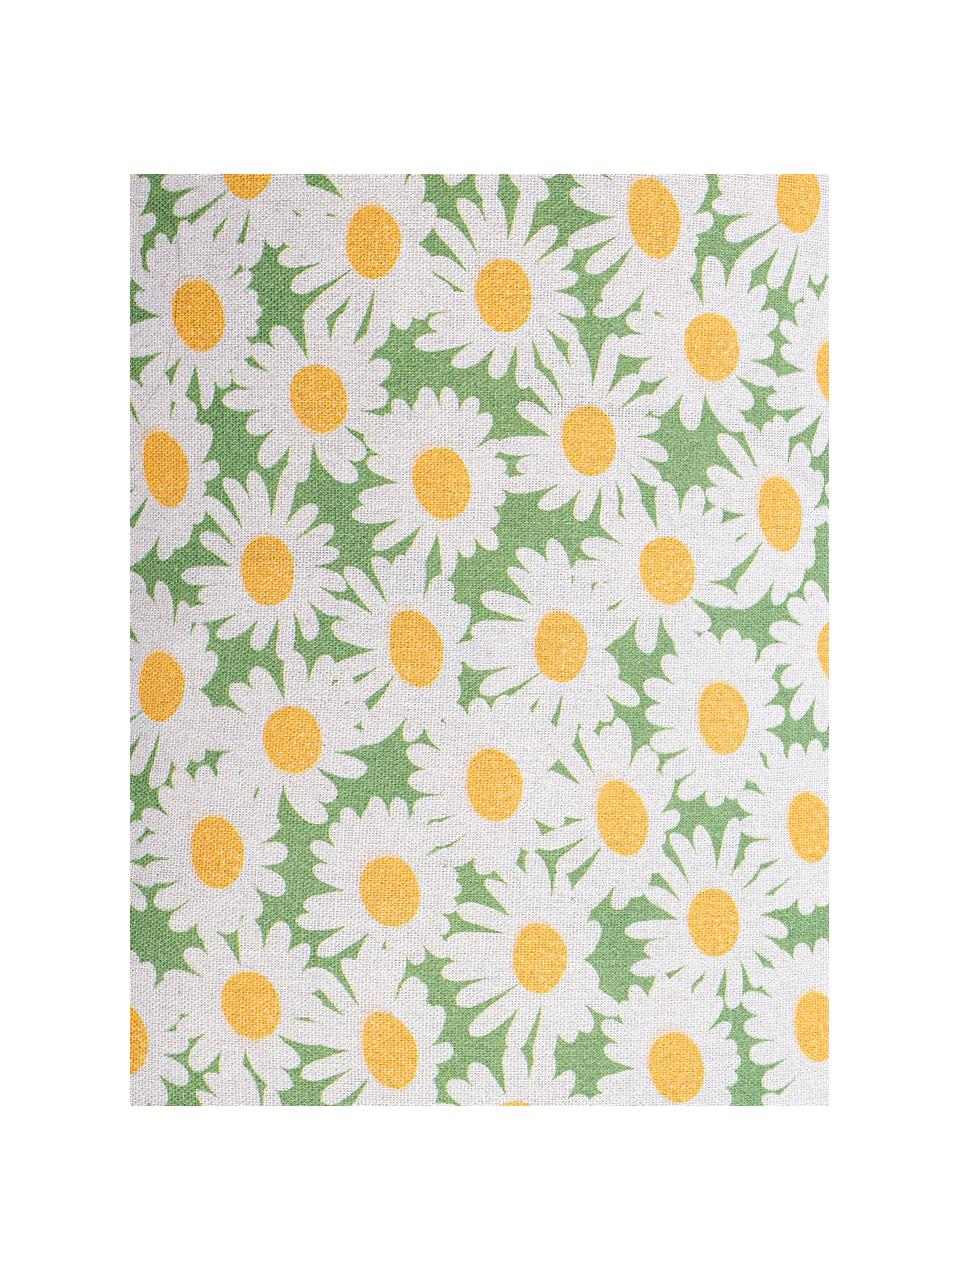 Kissenhülle Margerite mit Blumenmotiv, Webart: Halbpanama, Weiß, Grün, Gelb, 30 x 50 cm